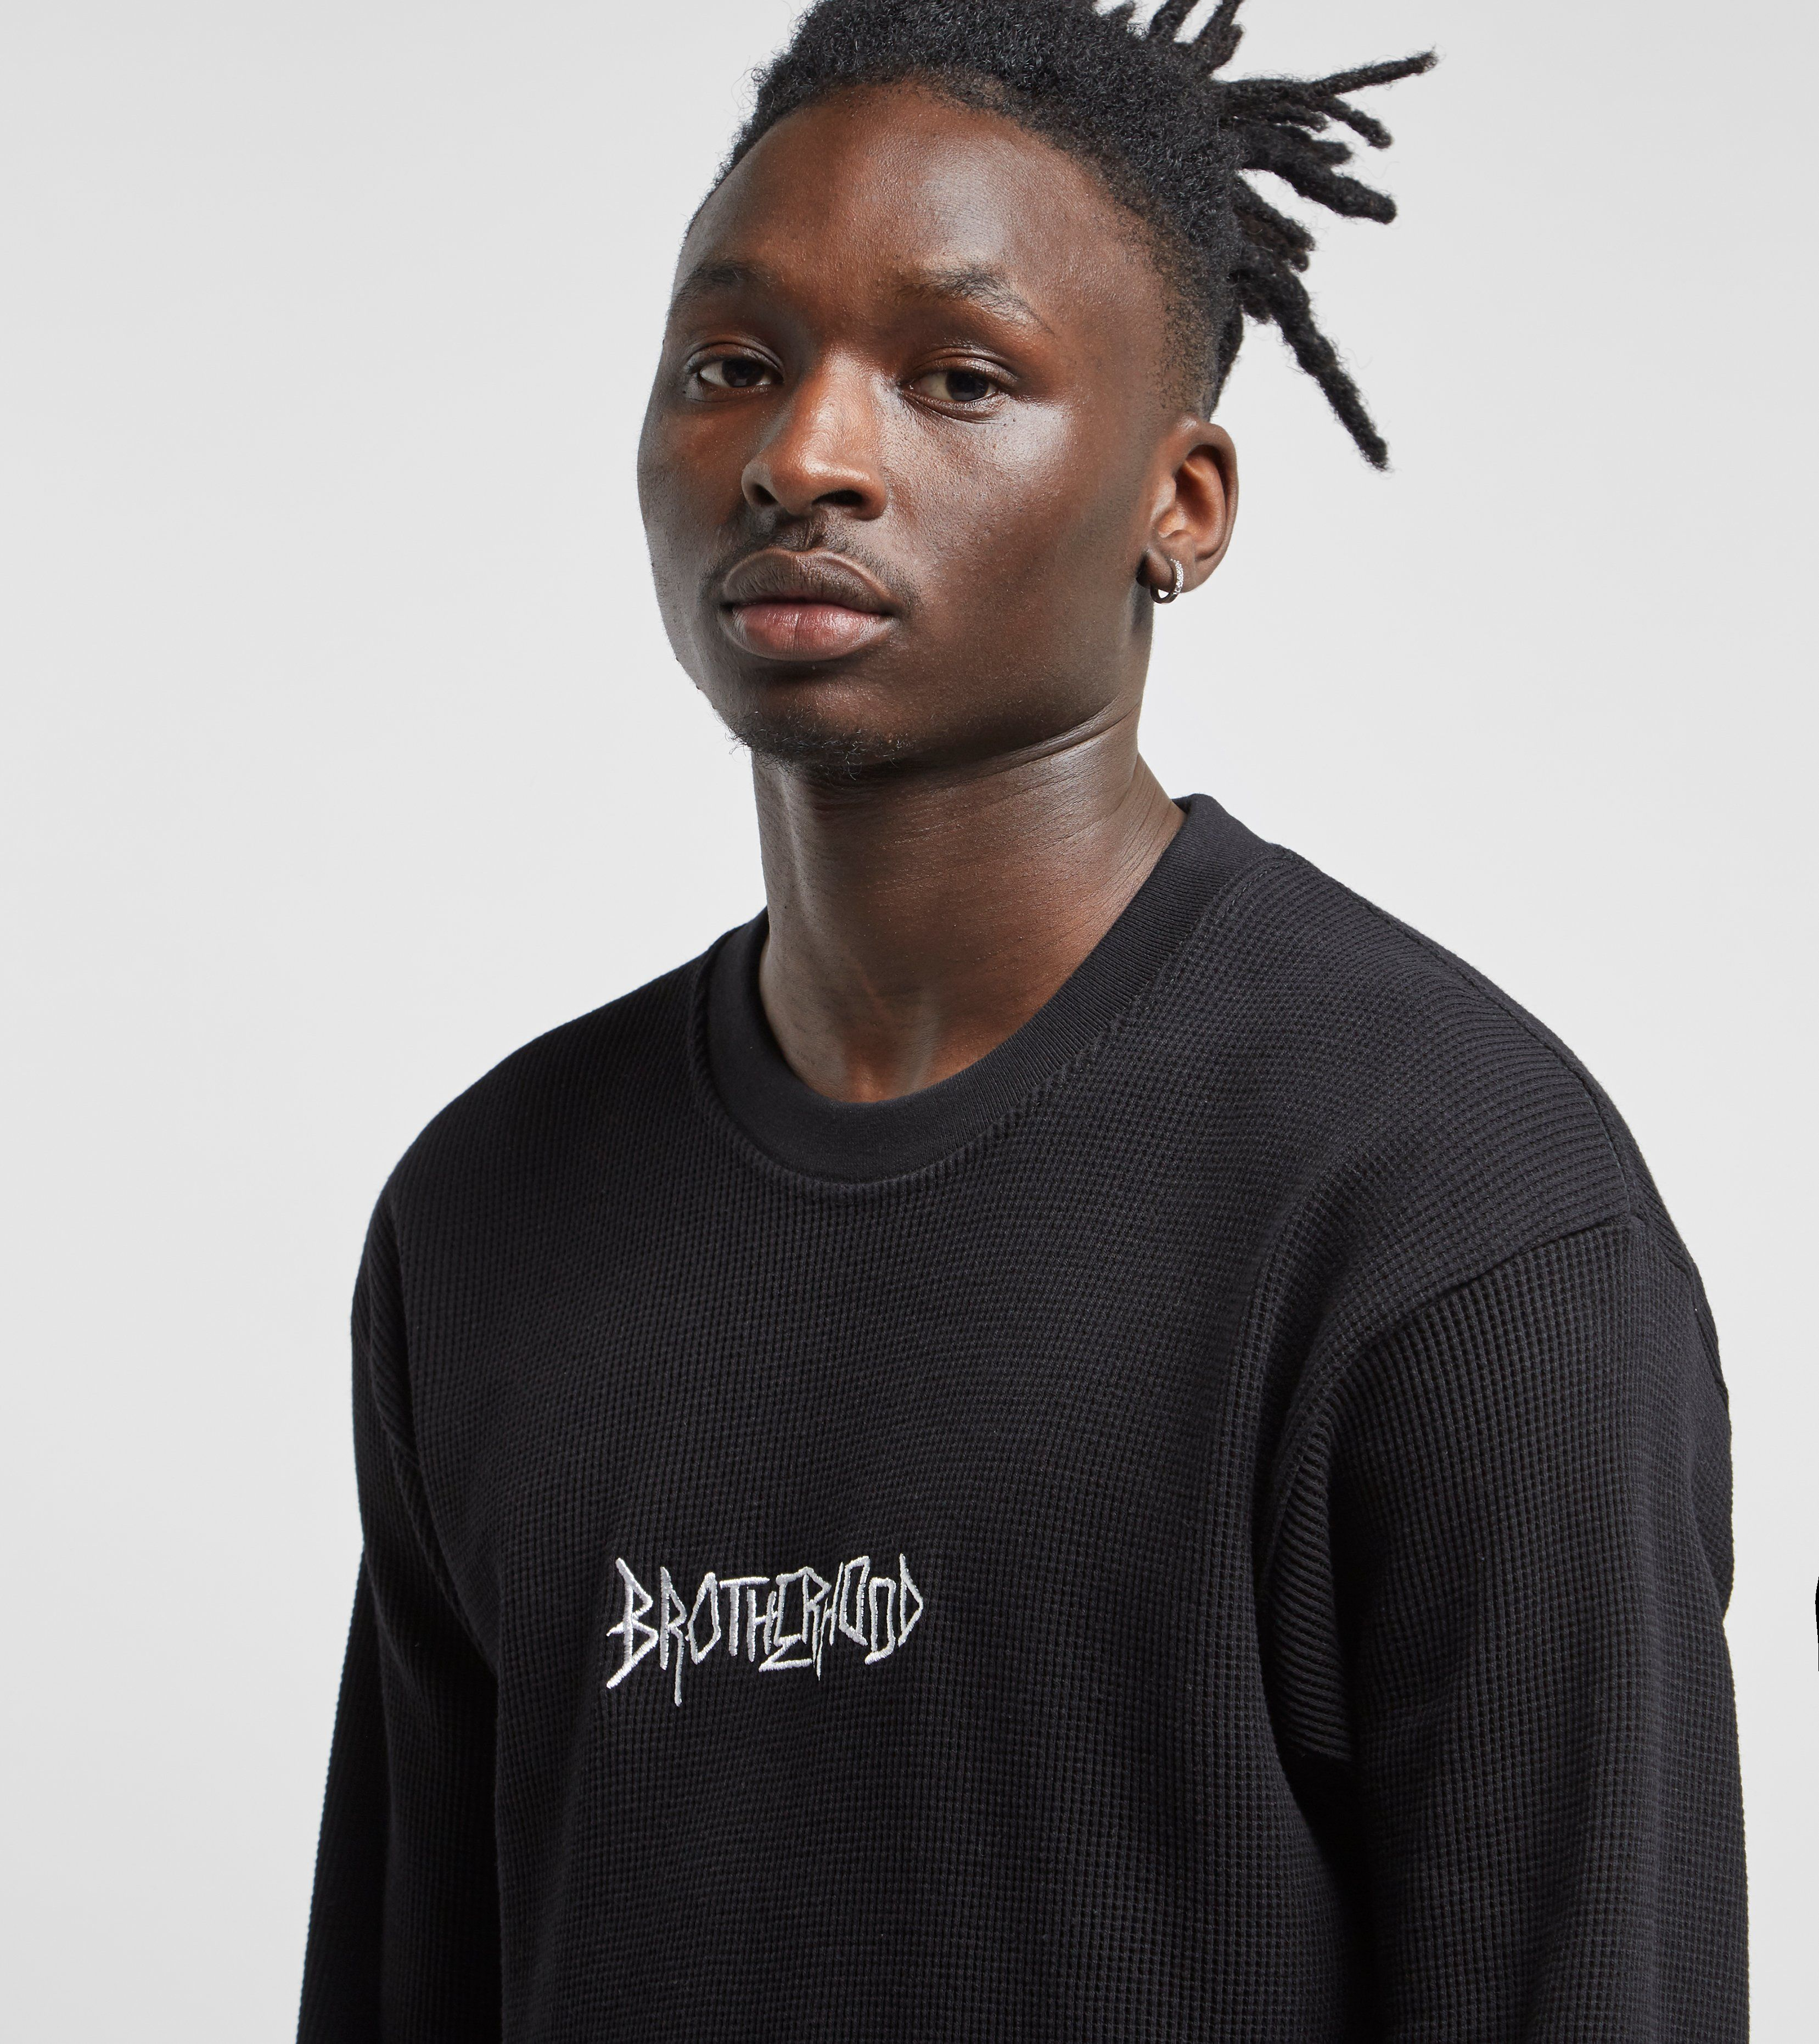 Brotherhood Icon Long Sleeved T-Shirt